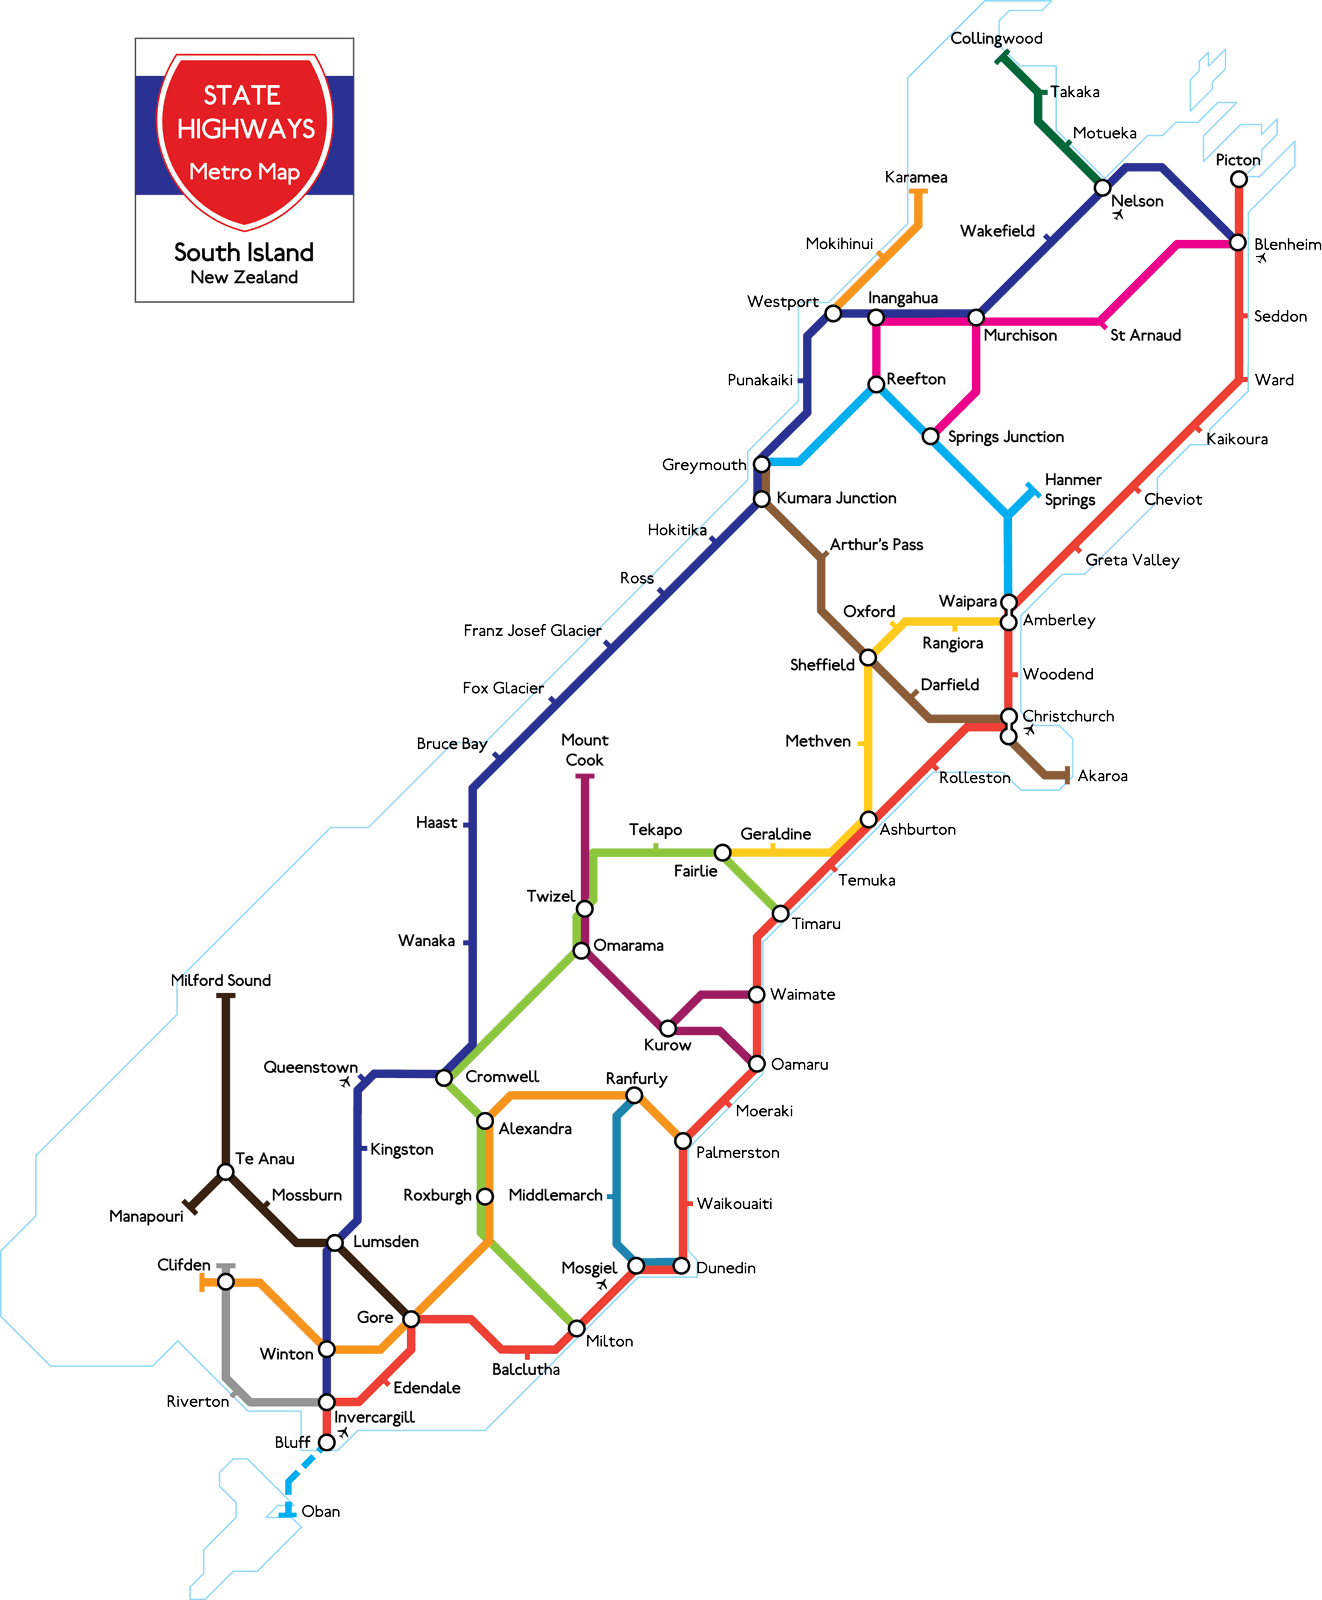 New Zealand Highway Map.New Zealand Metro Map T Shirt